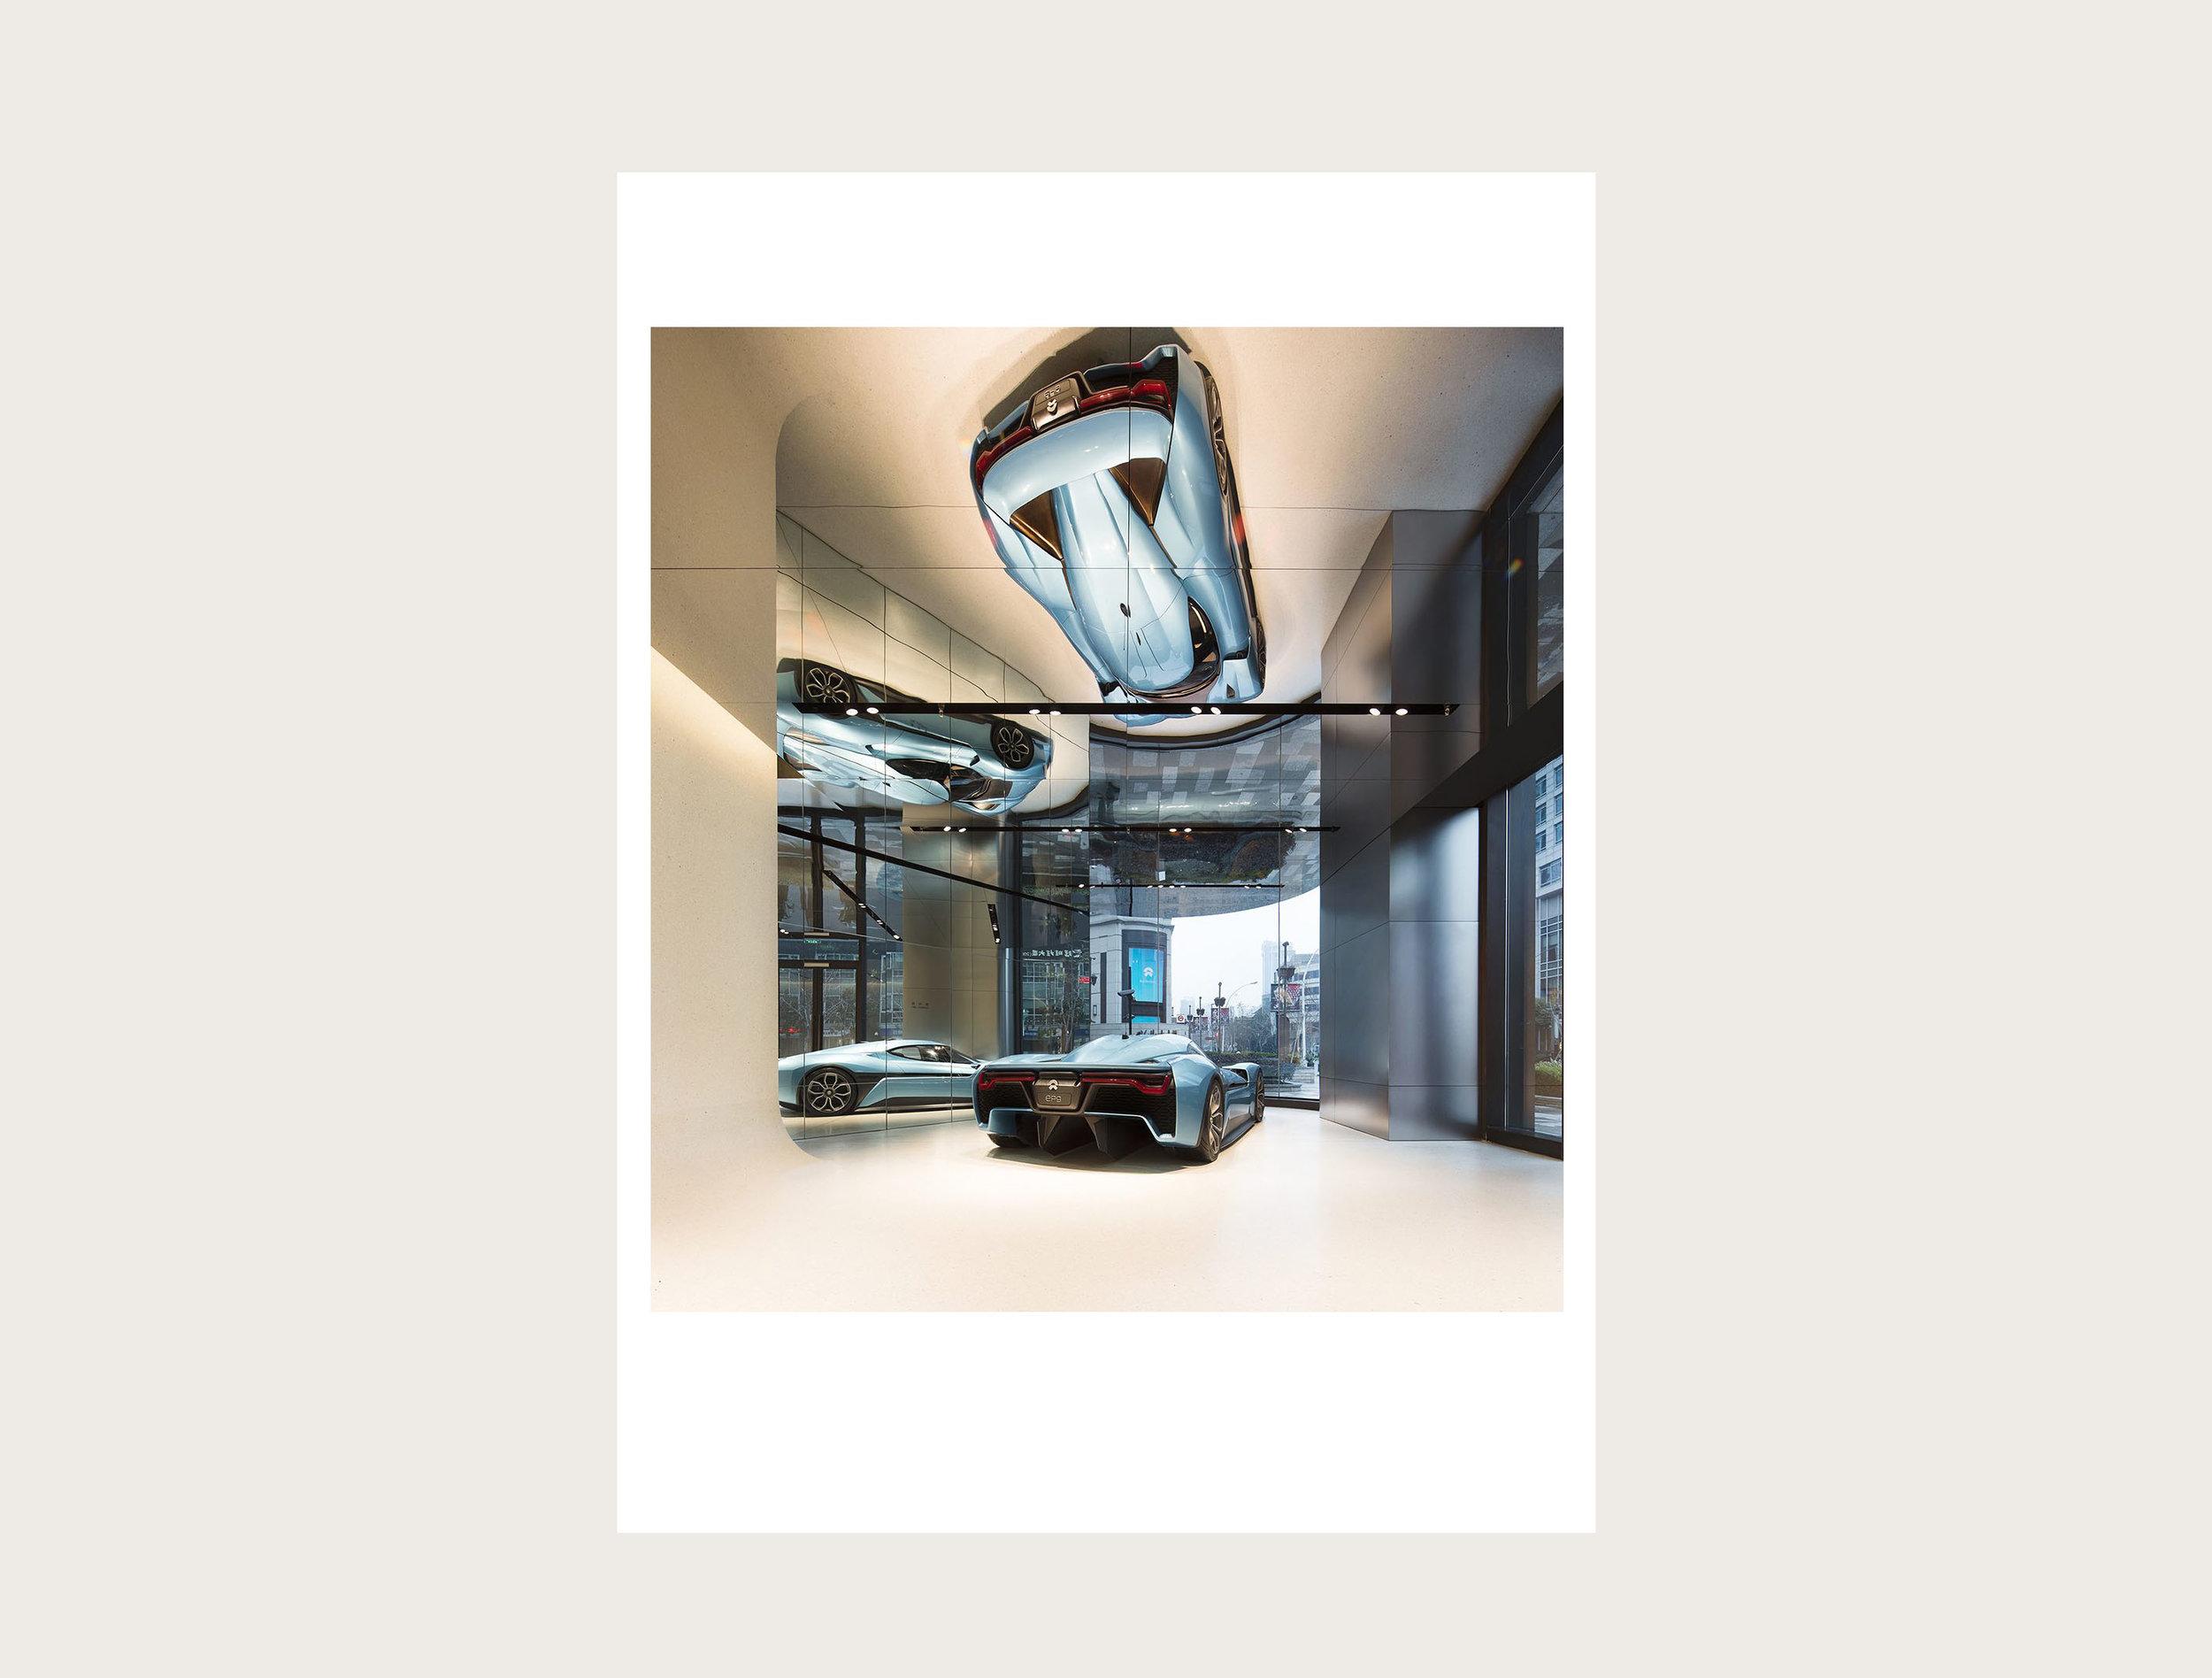 raams-architecture-design-studio-german-roig-garcia-architect-electric-car-coche-electrico-shanghai-nio-house-SHL_NIO-Showroom_@RawVision_09-1170x1715.jpg